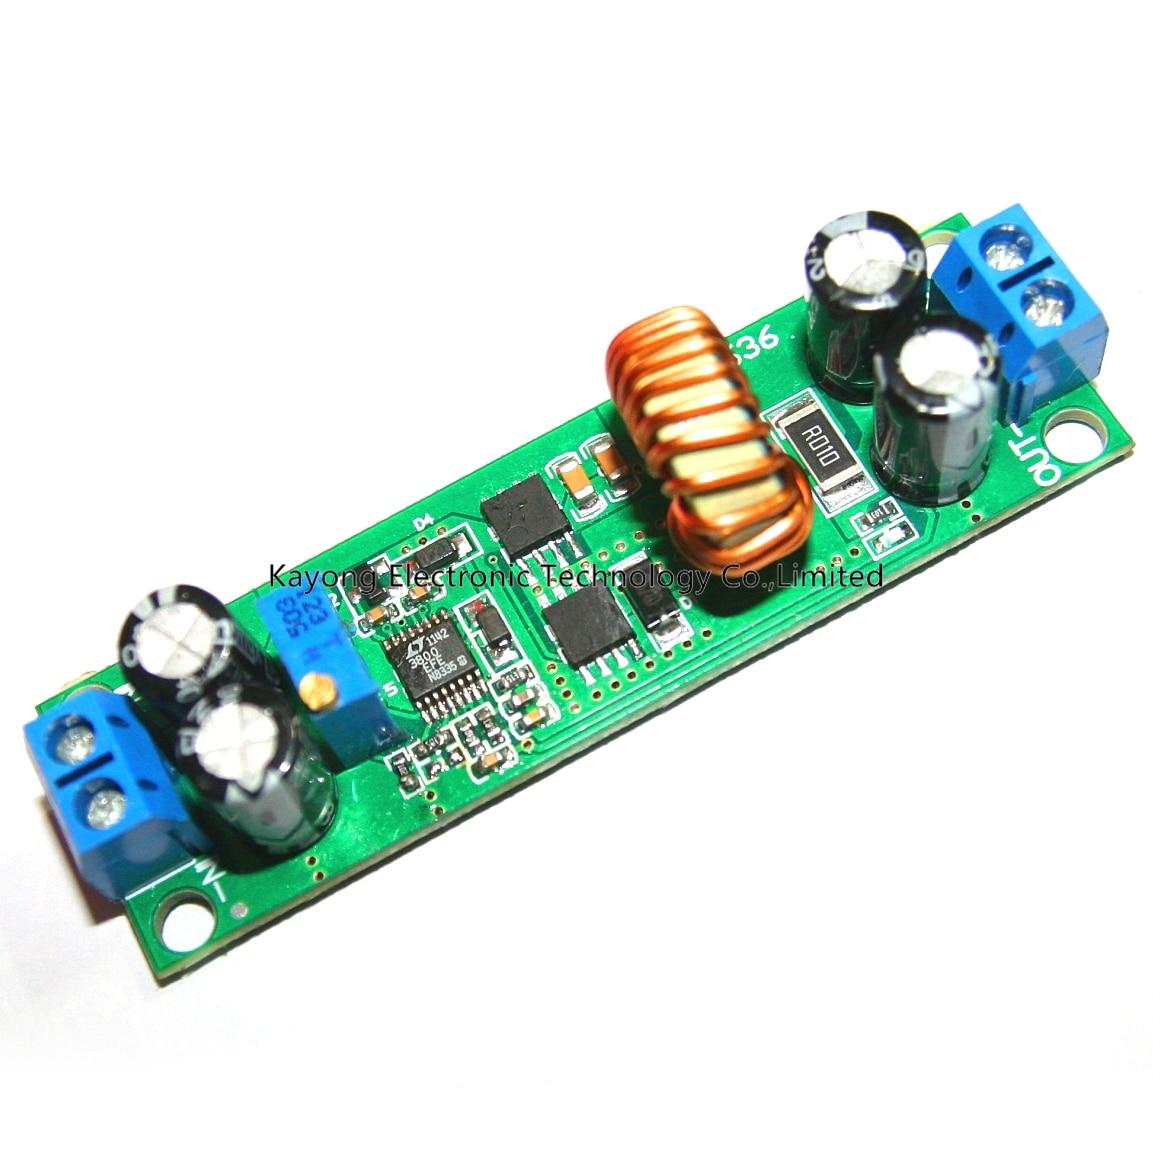 Xl7015 Dc 80v Adjustable Step Down Module Power Supply 3v To 24v Variable Electronic Circuits Home 60v 48v 36v 19v 12v 9v 5v Car Charger Regulator